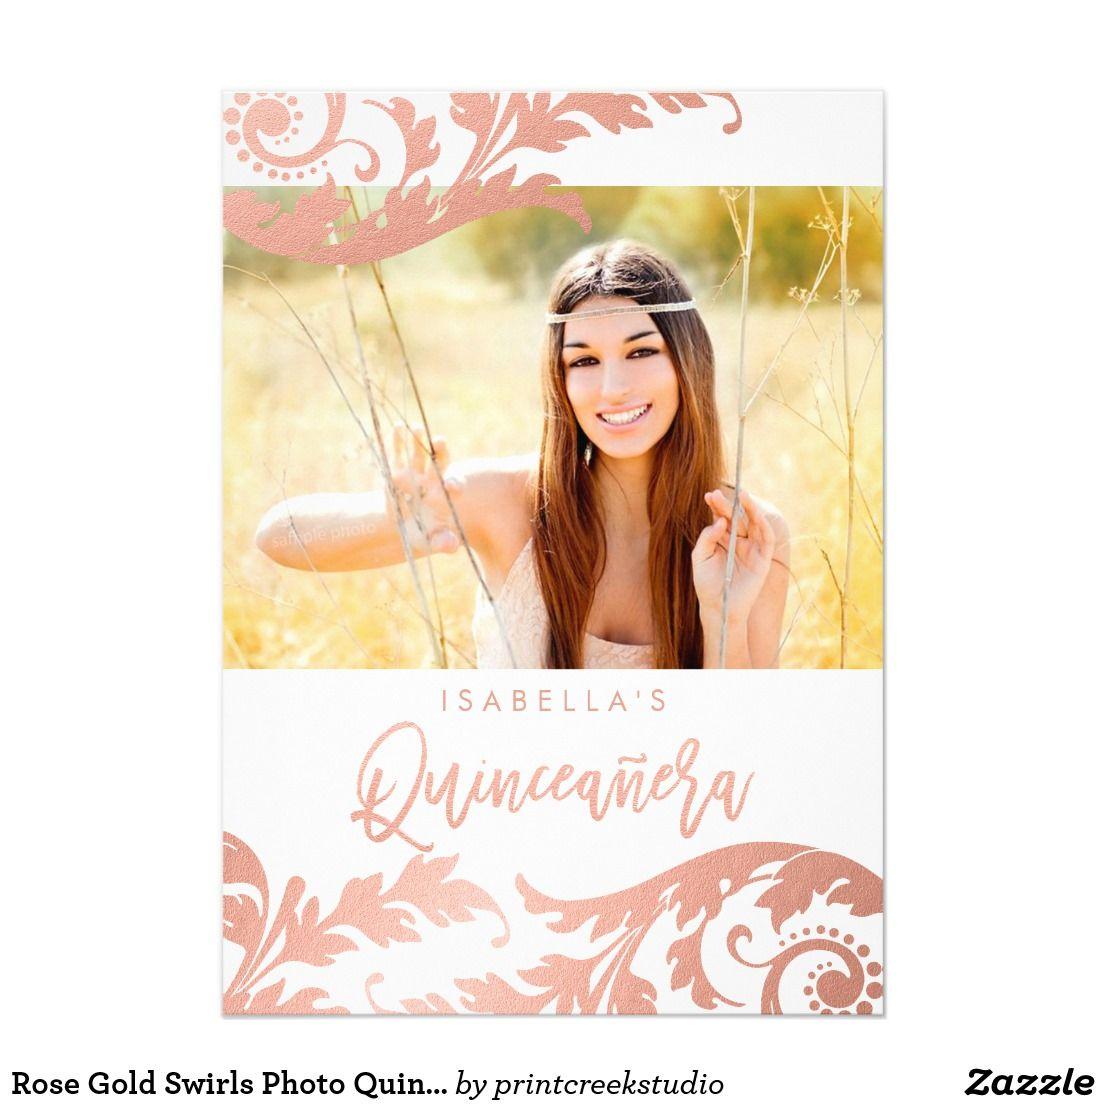 Rose Gold Swirls Photo Quinceanera Invitations Quinceanera Invitations